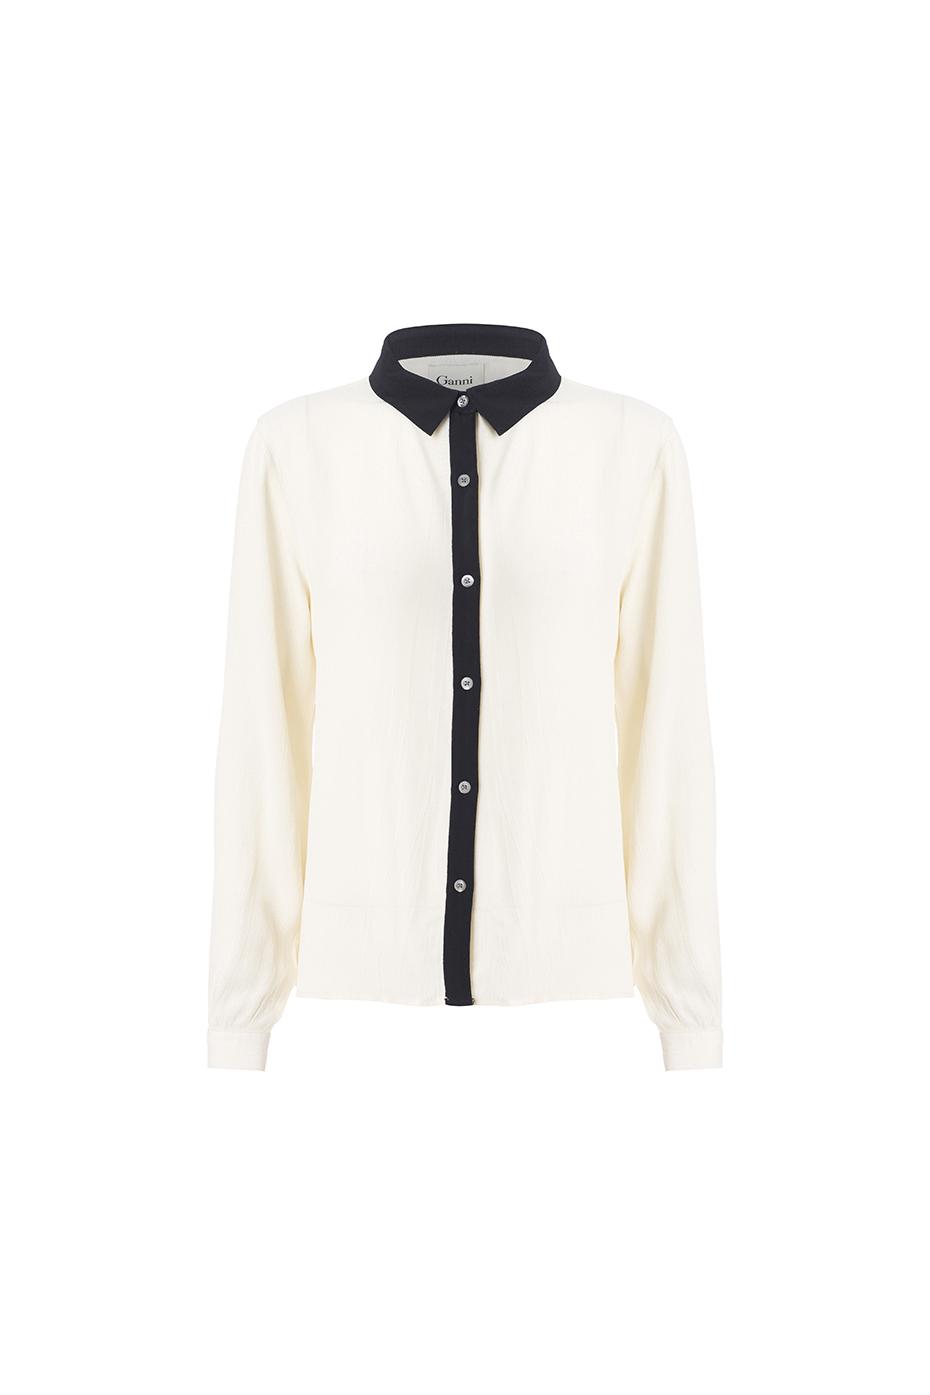 Shirts & Blouses > Shirt